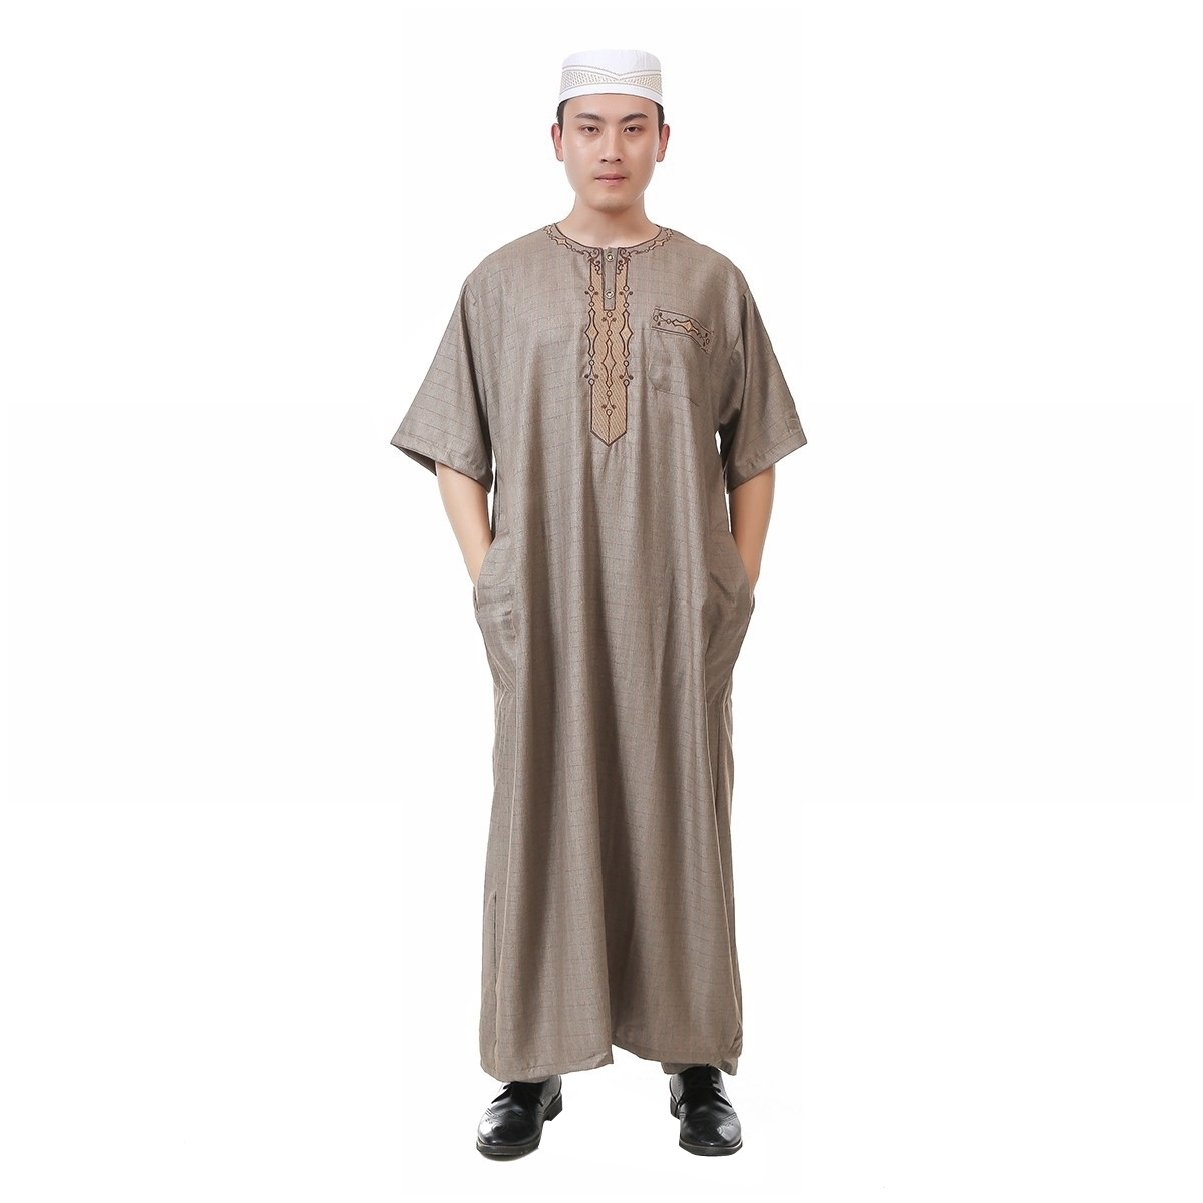 Coolred Men's Short-Sleeve Cotton Linen Blend Summer Plaid Muslim Thobe Coffee 56